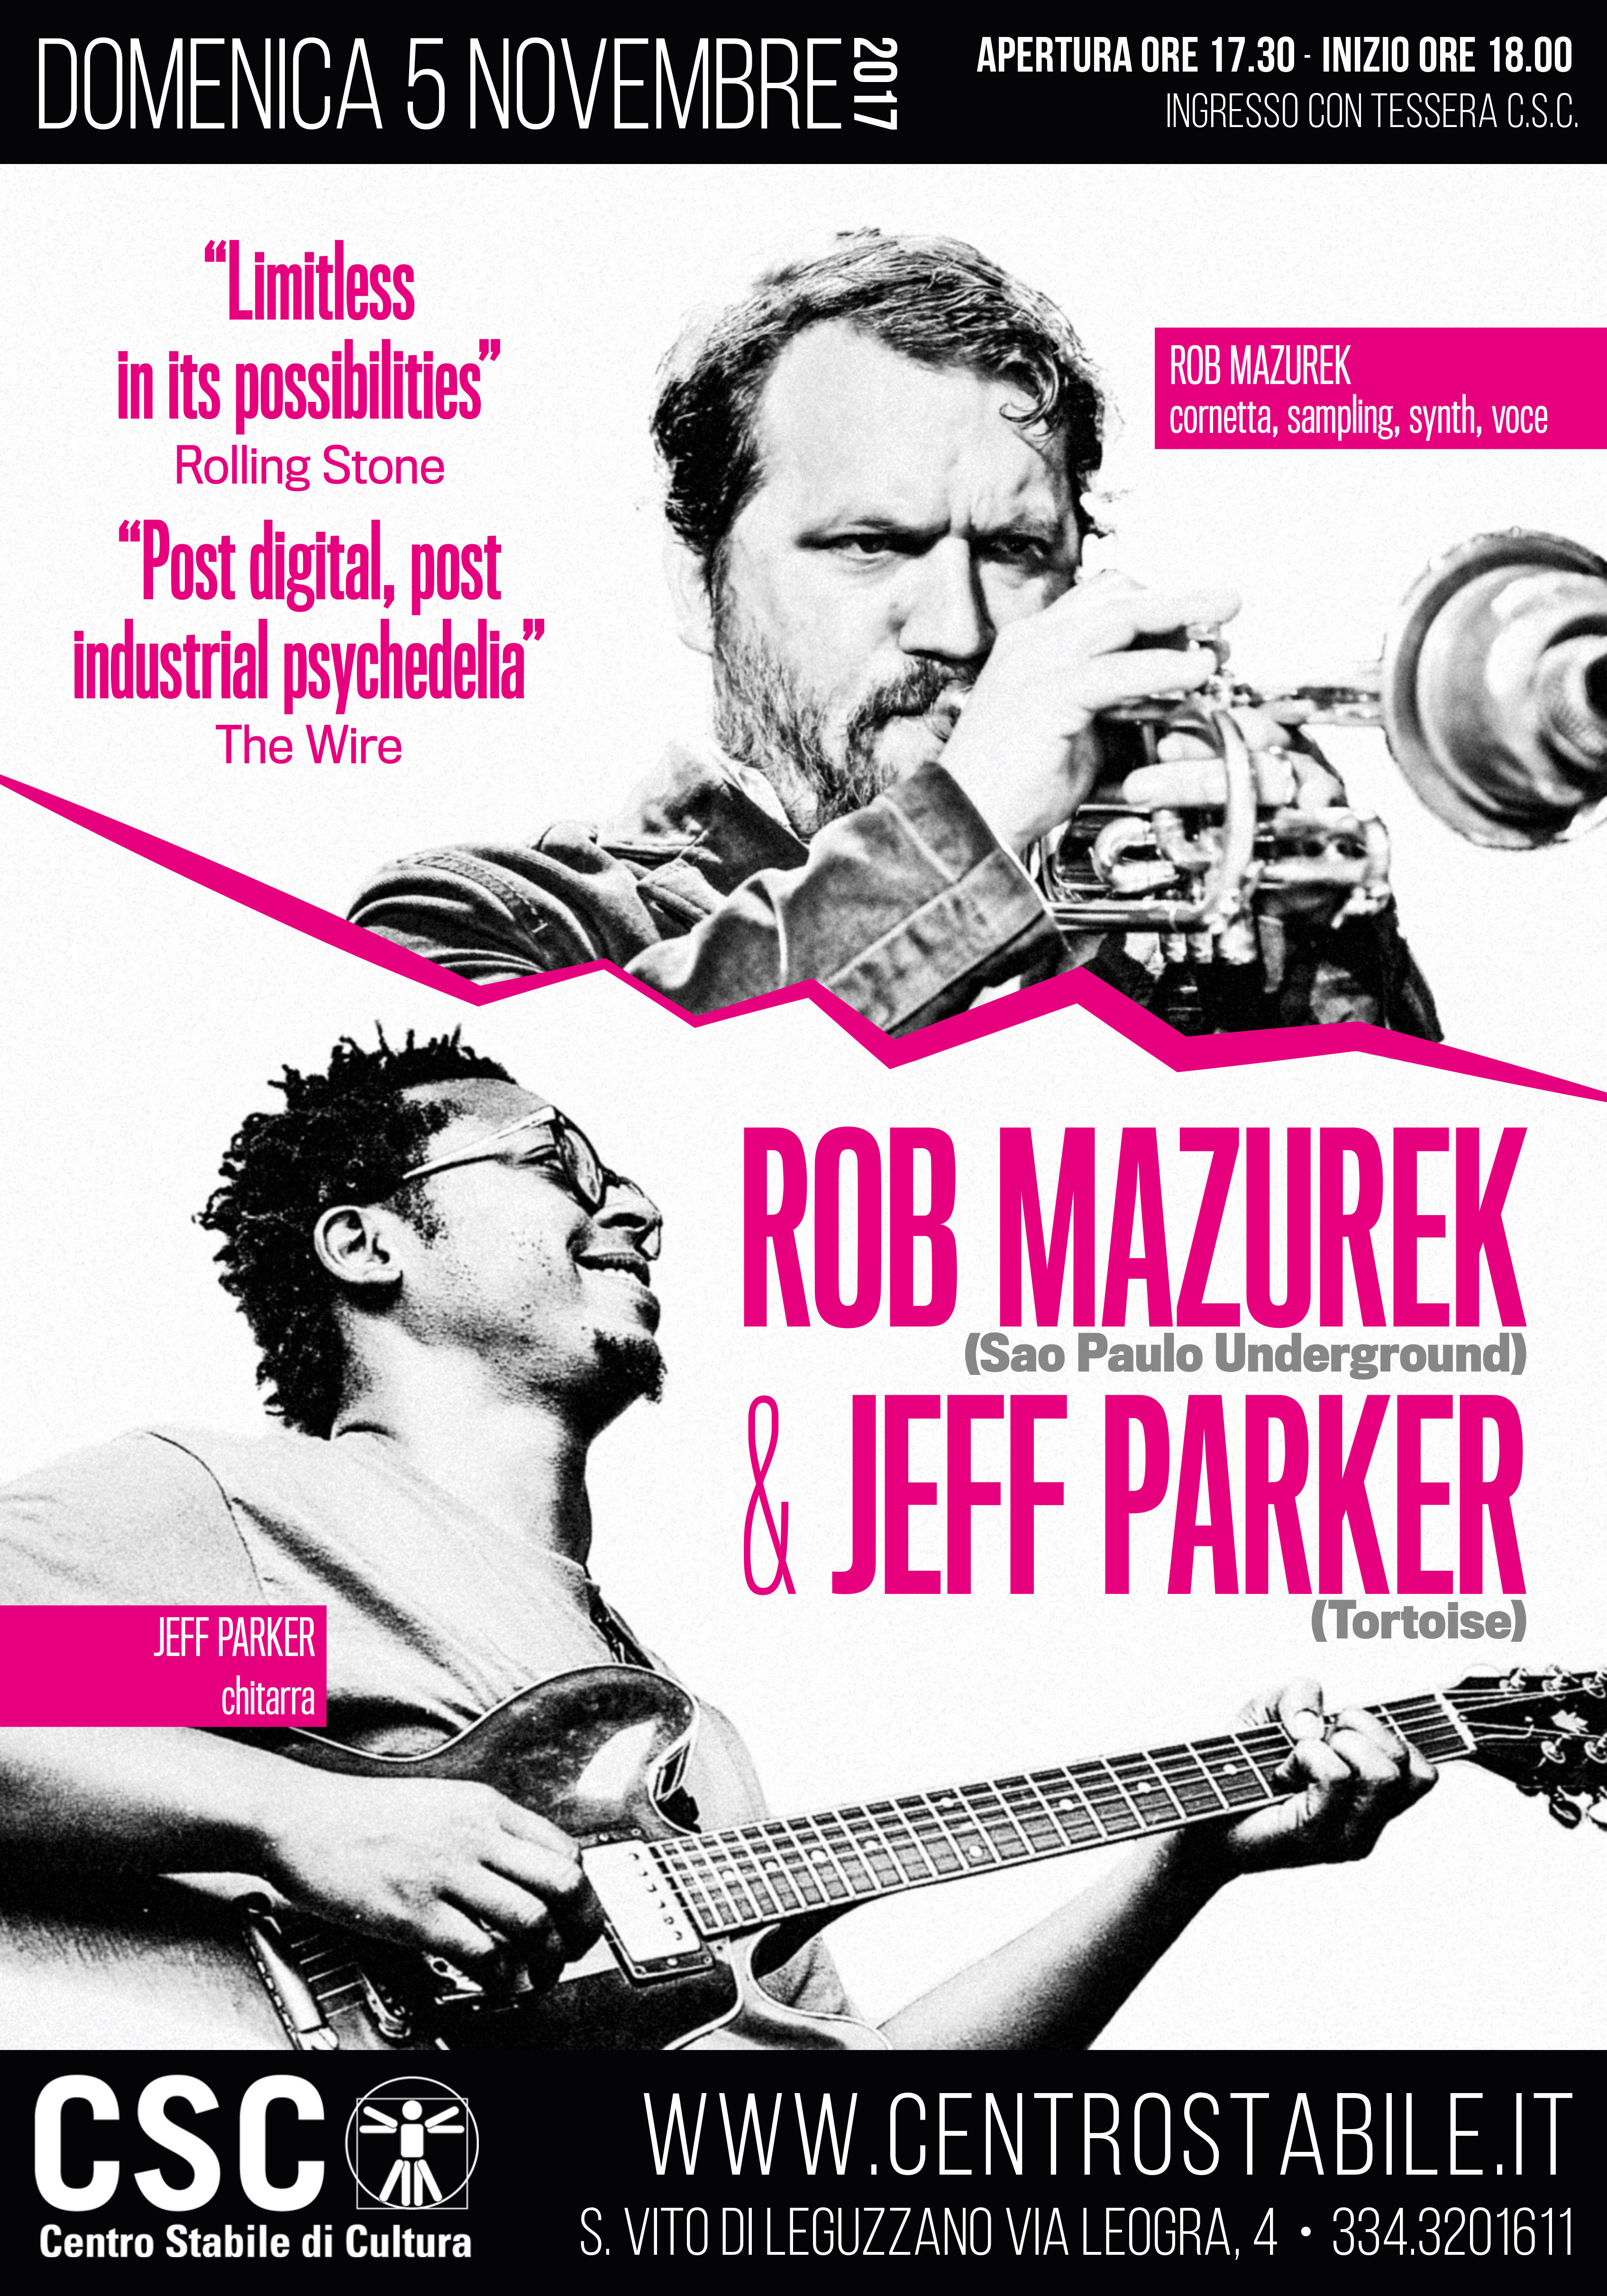 ROB MAZUREK (Sao Paulo Underground) & JEFF PARKER (Tortoise)